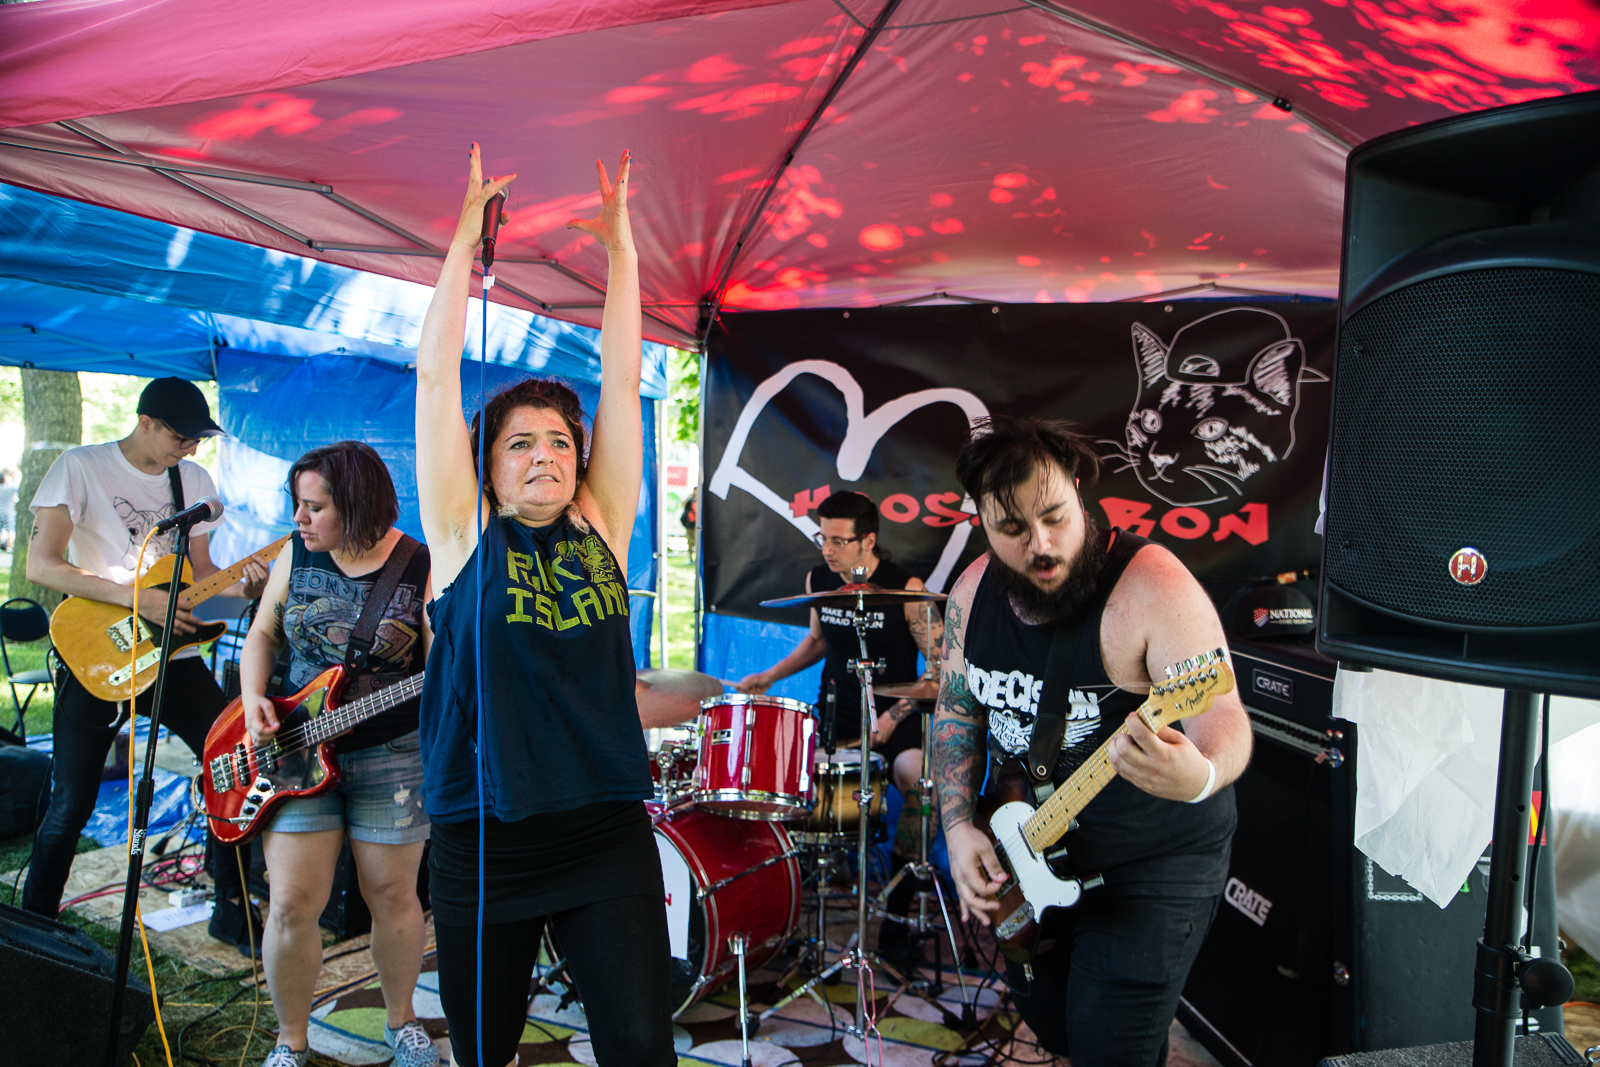 JeanetteDMoses-PunkIsland2017-18.jpg